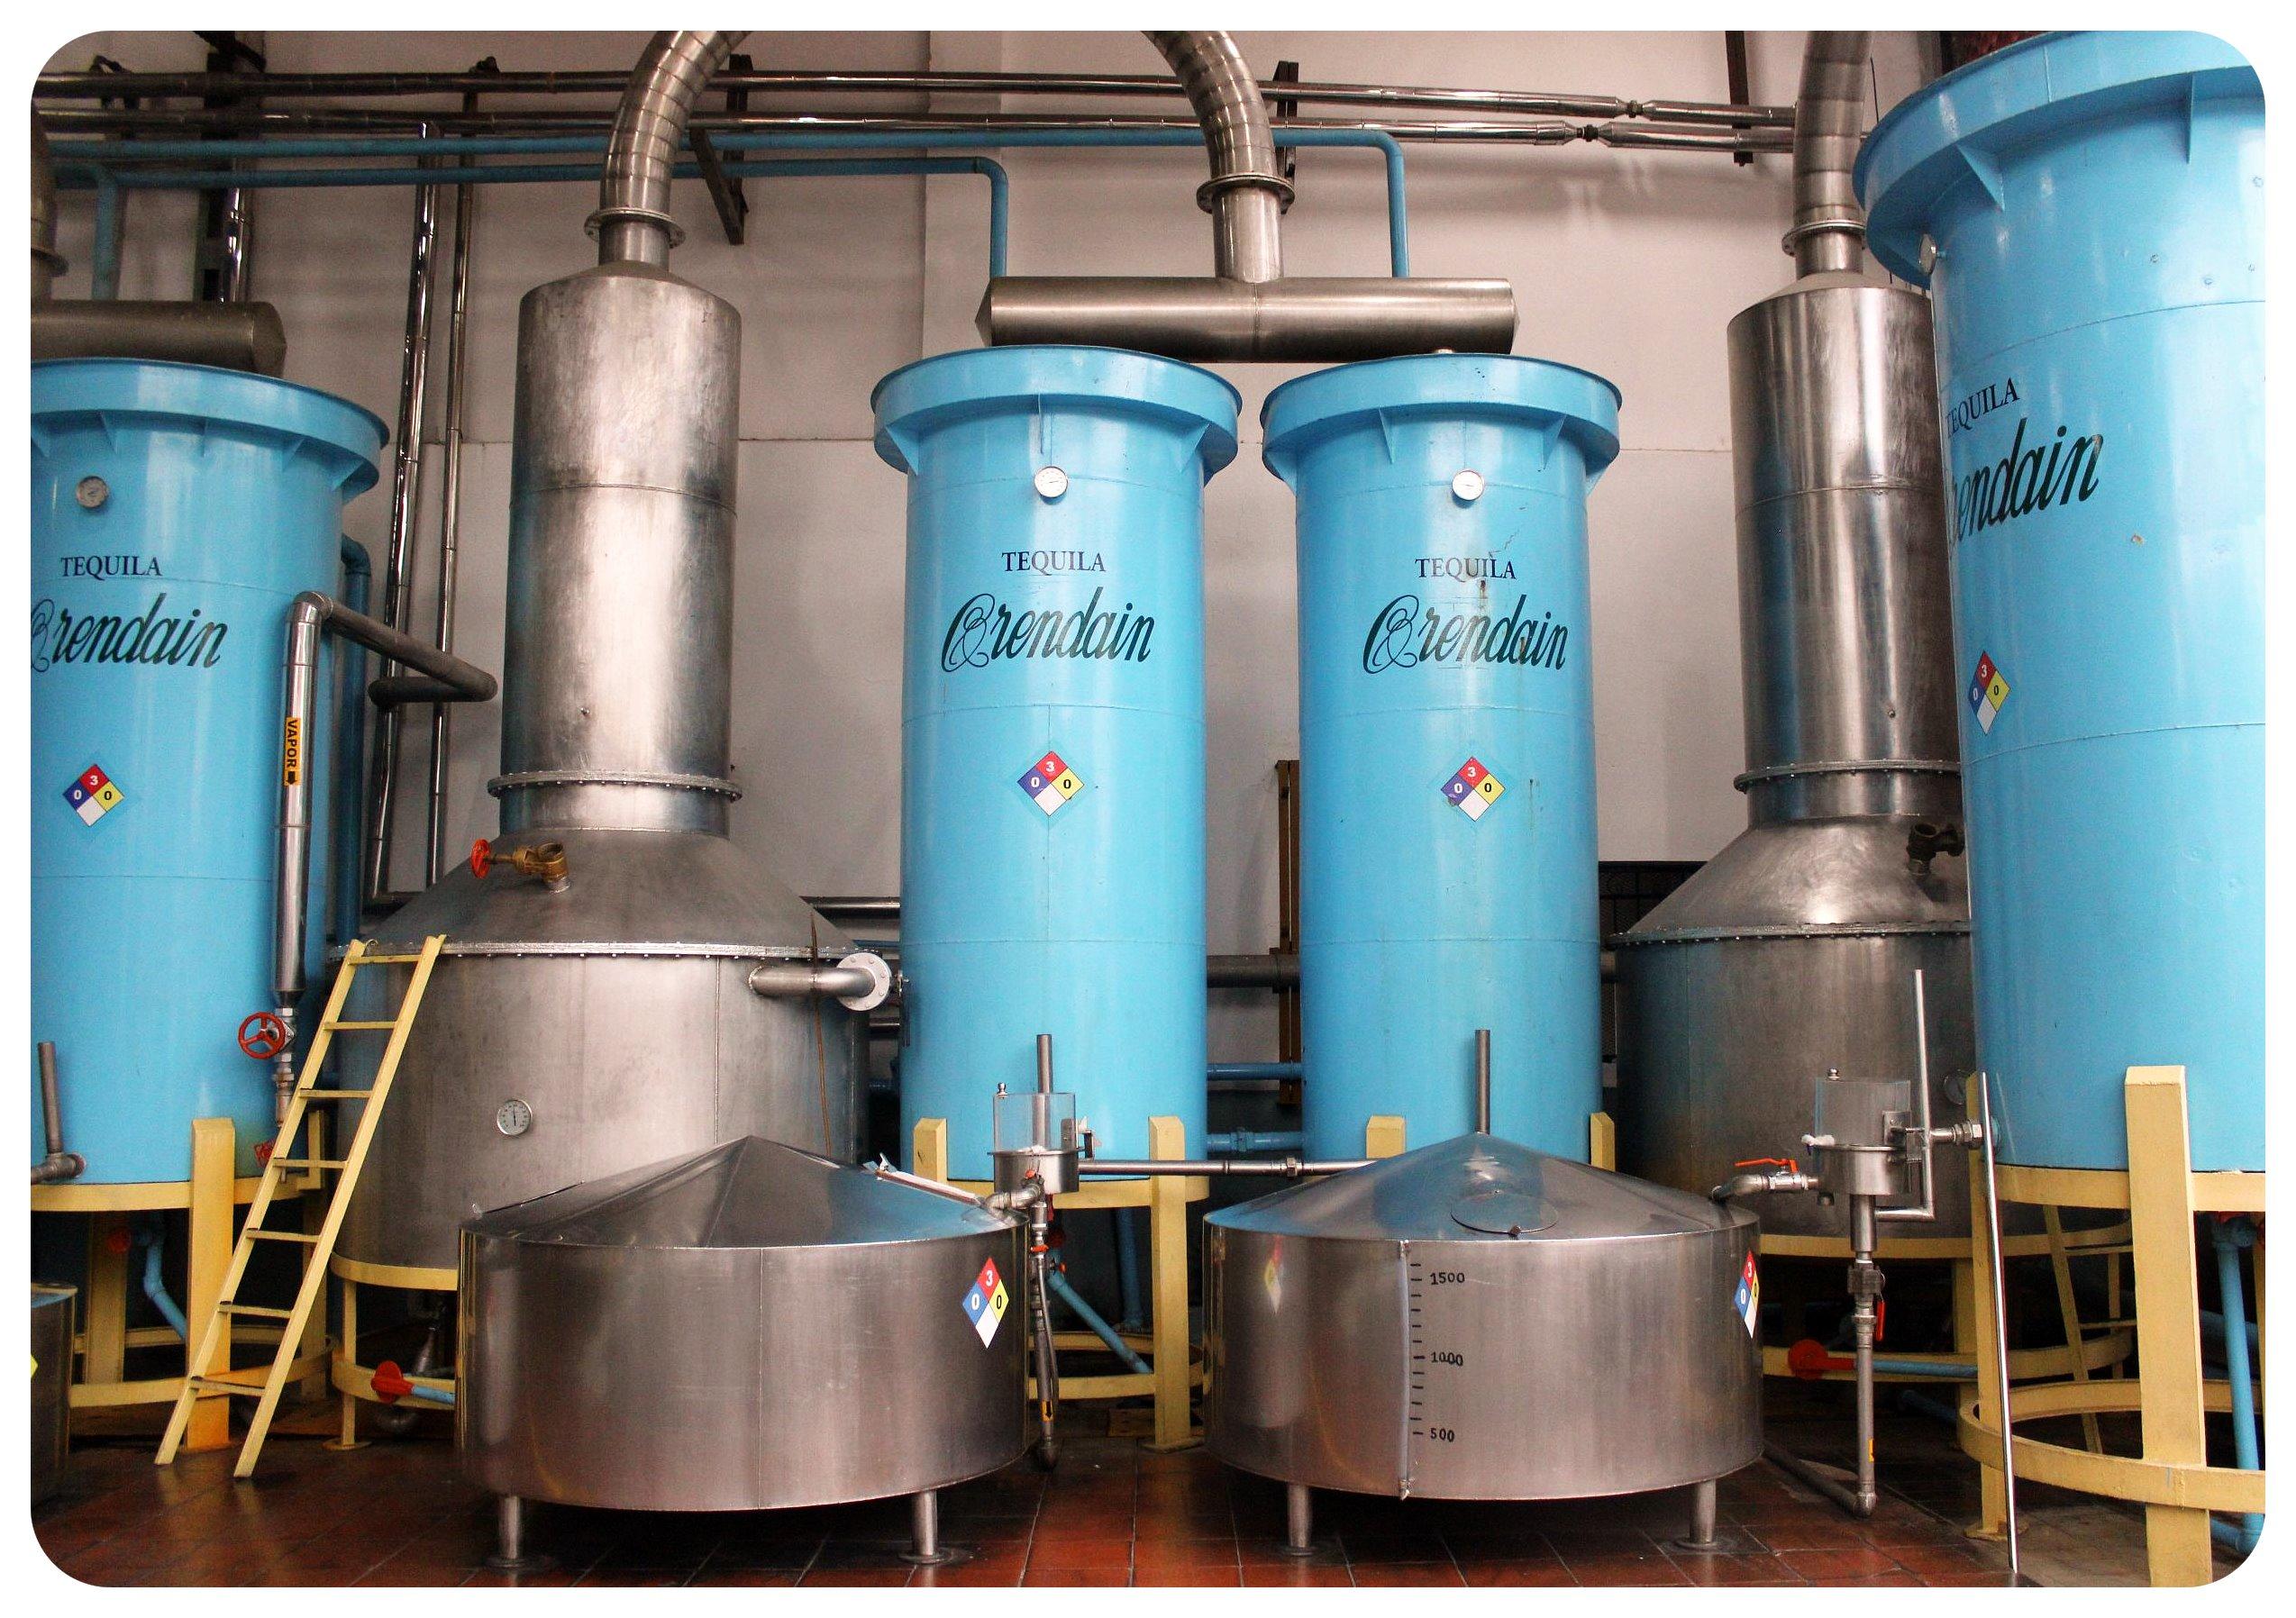 tequila orendain distillery